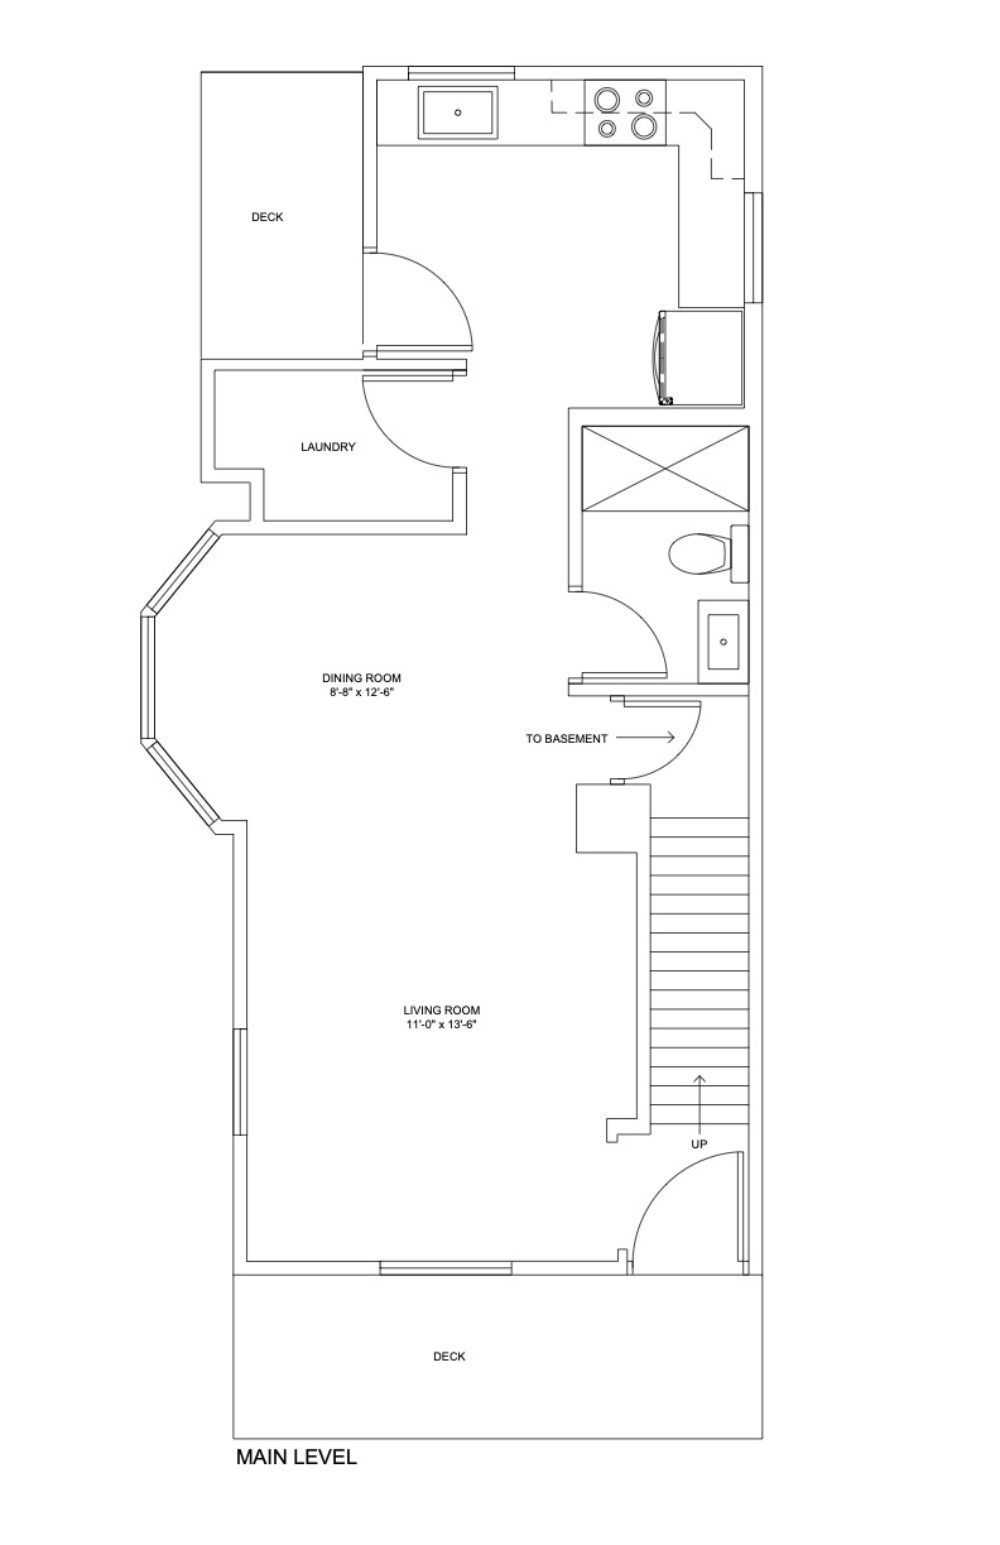 712 Initiative Housing Revitalization Program 2307 3rd Ave Main Level copy